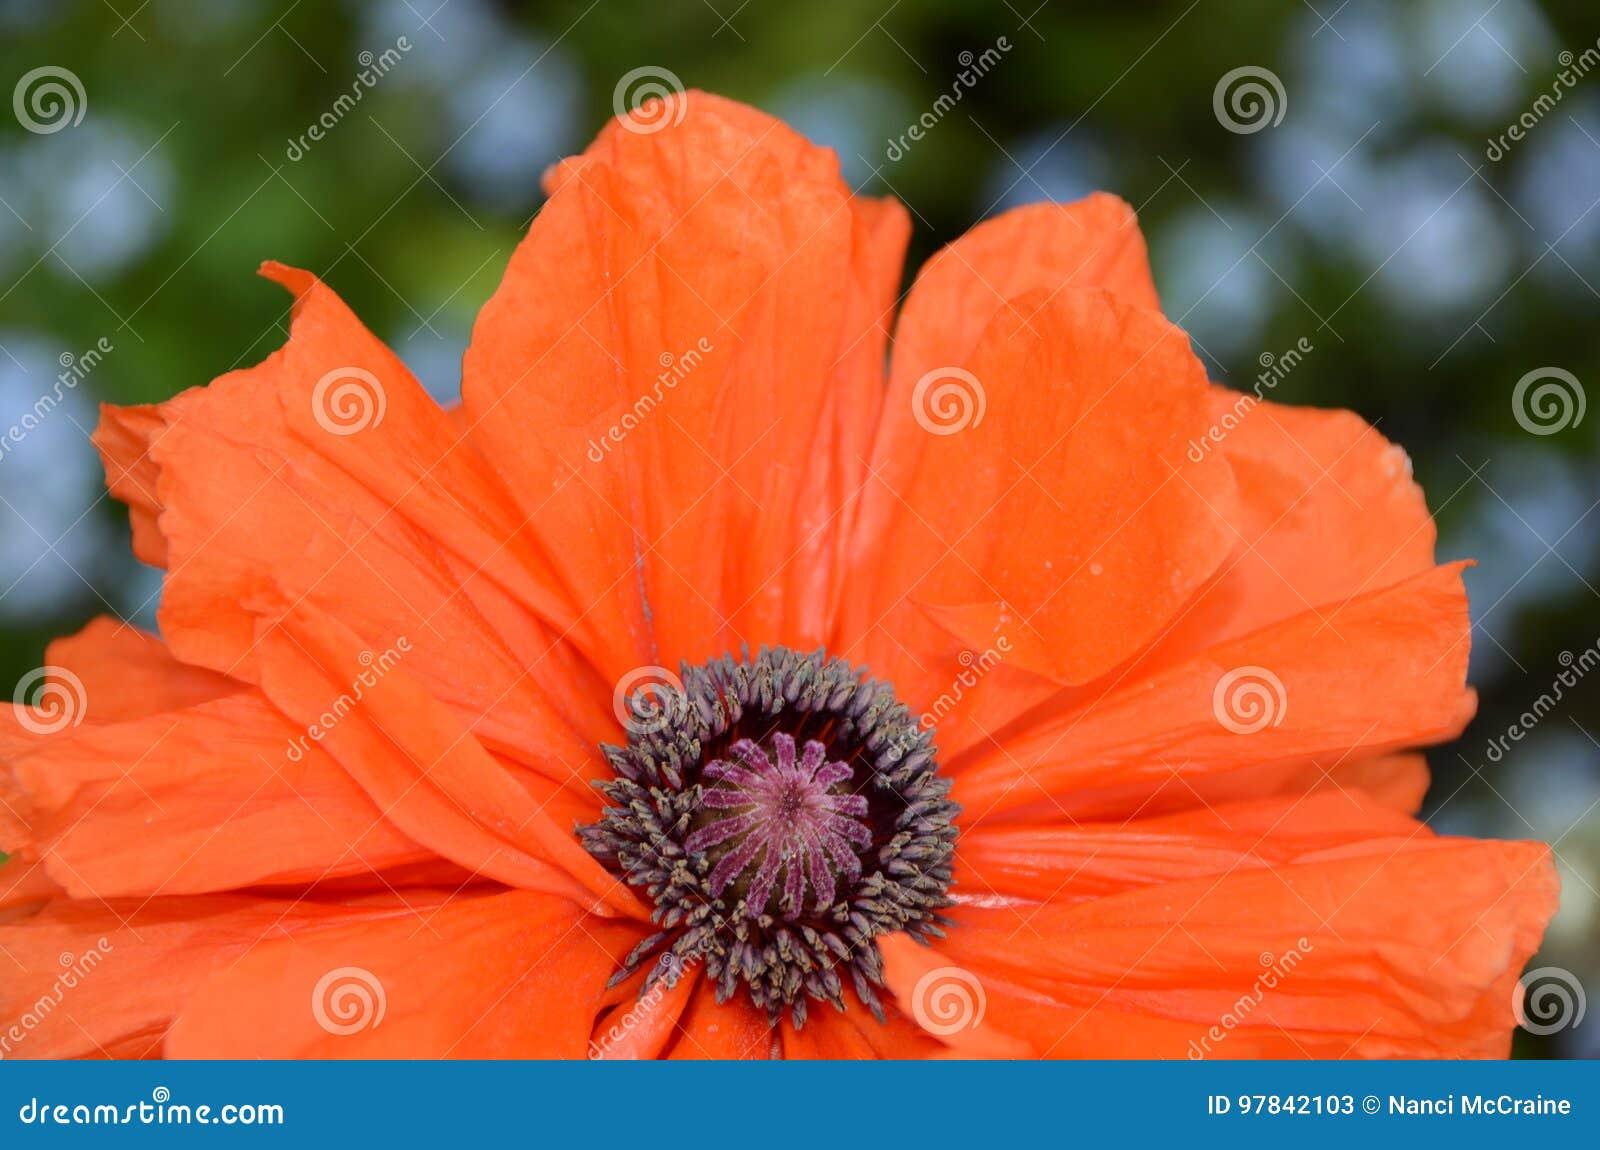 Life Of A Poppy Flower Full Glory Orange Petals Stock Image Image